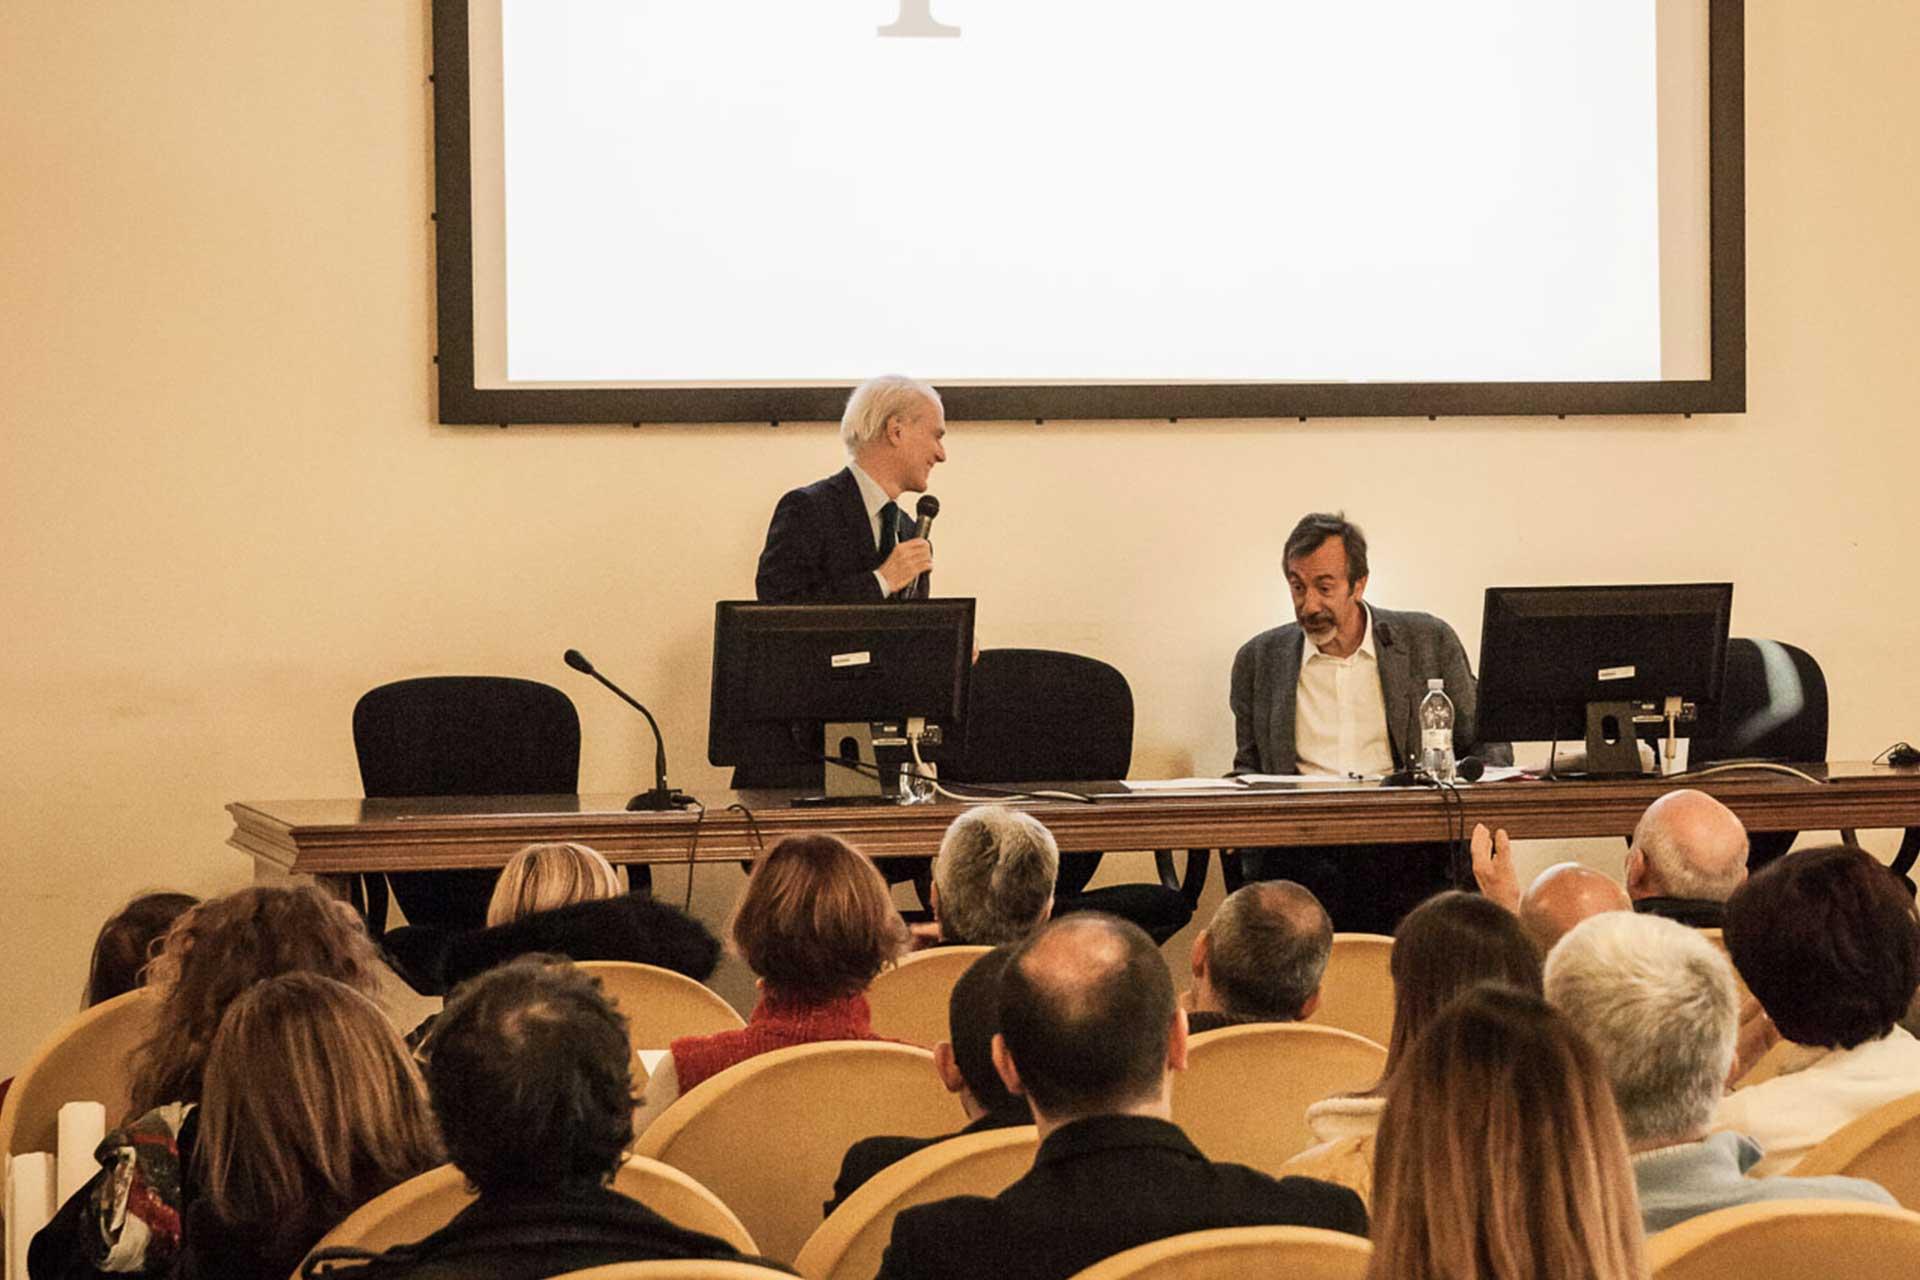 Fontane di Sardegna - Mostre e Convegni - 1 oriz